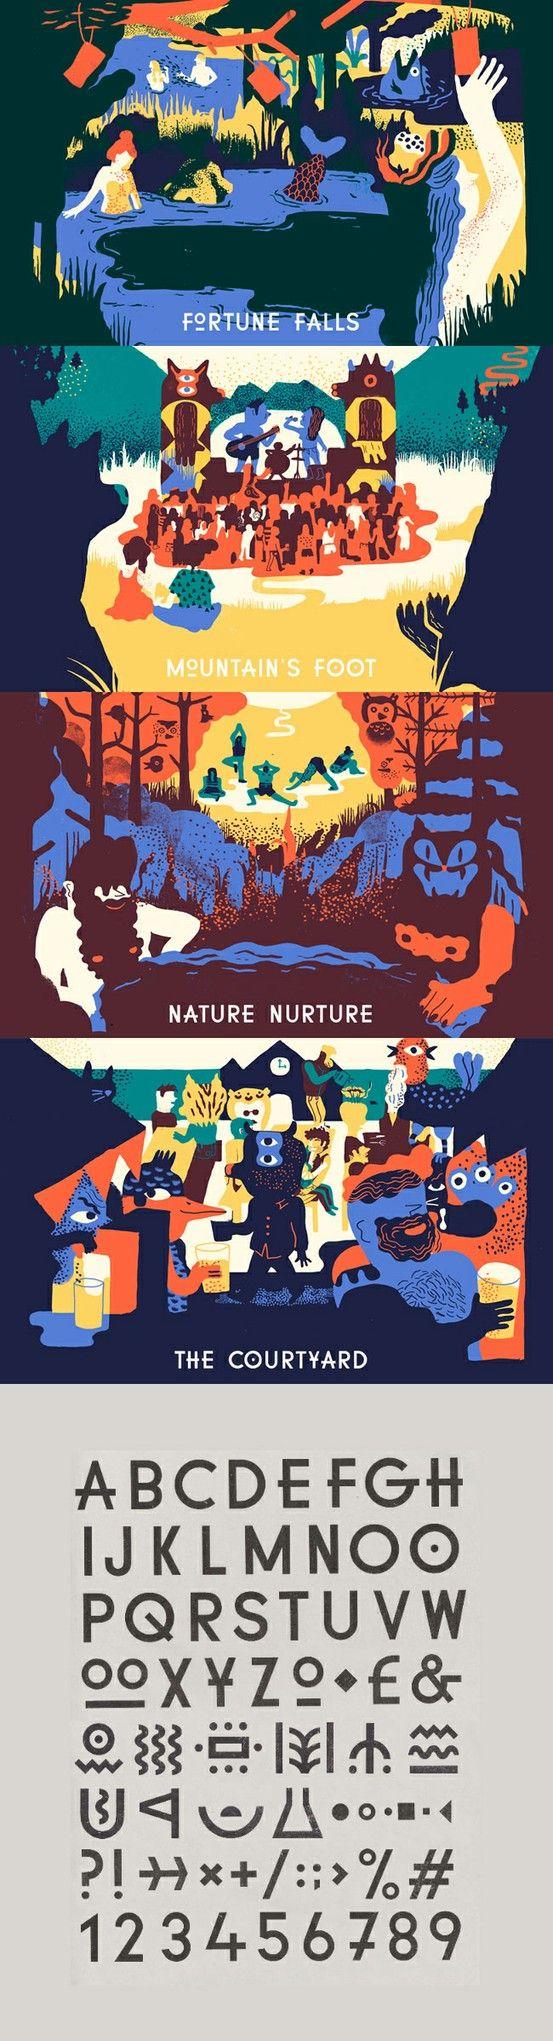 Green Man Festival by YCN Studio http://www.ycnstudio.com/ – Via Identity Designed